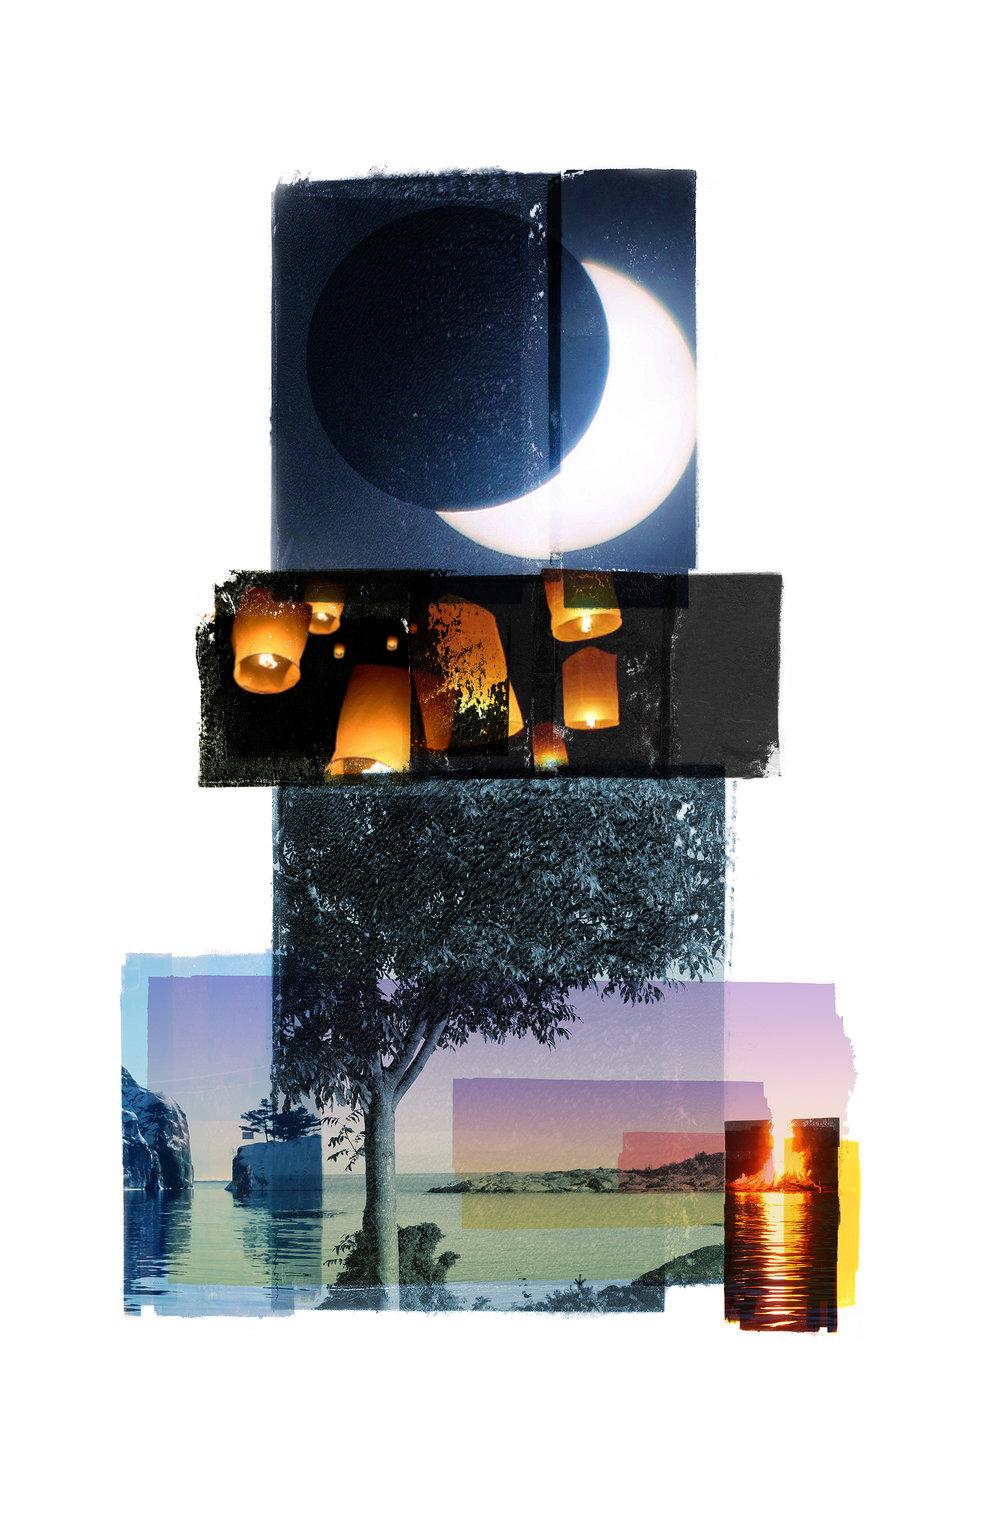 Ascend / Eclipse of the sun / Olsok (Archipelago)  Photolitho / BFK Rives 250 gr 57 x 38 cm / 22,5 x 15 in Edition of 100 + 10 A Editeur: IDEM PARIS / Per Fronth   18/2016: